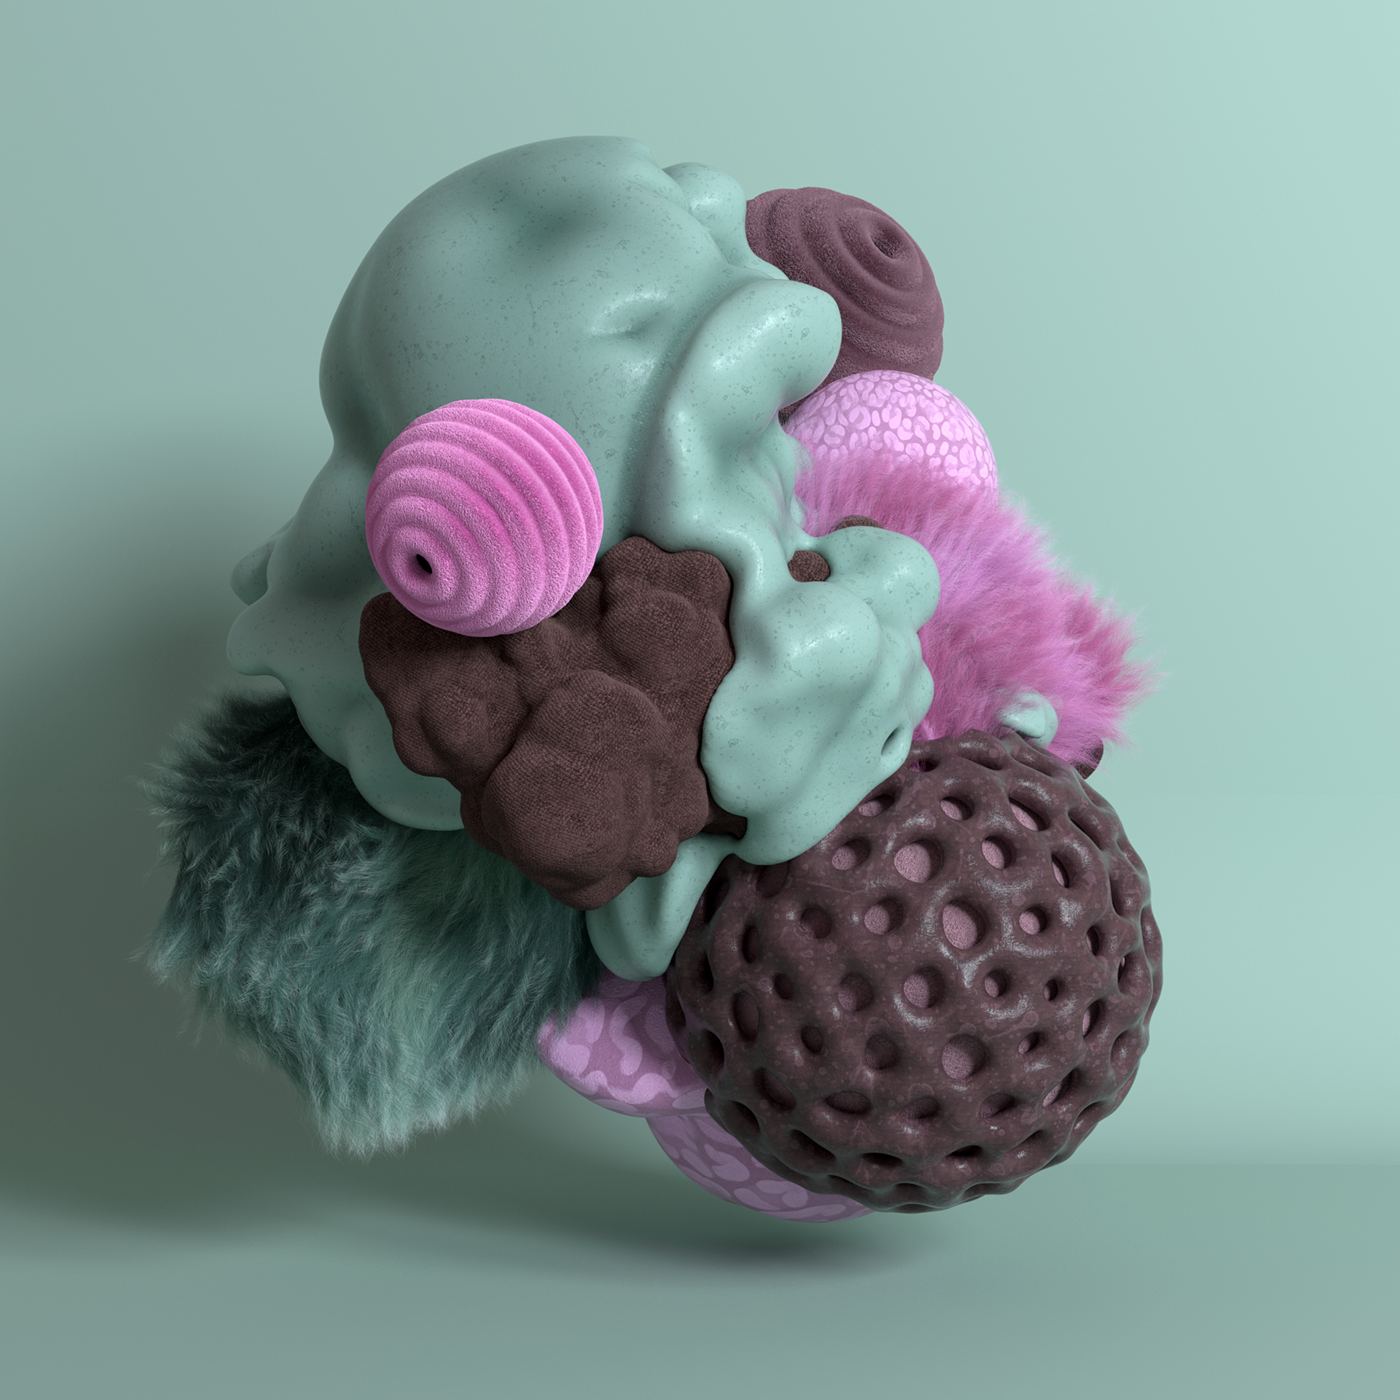 cinema 4d organic volumes cloth hair 3D 3d design Octane Render textile fusion